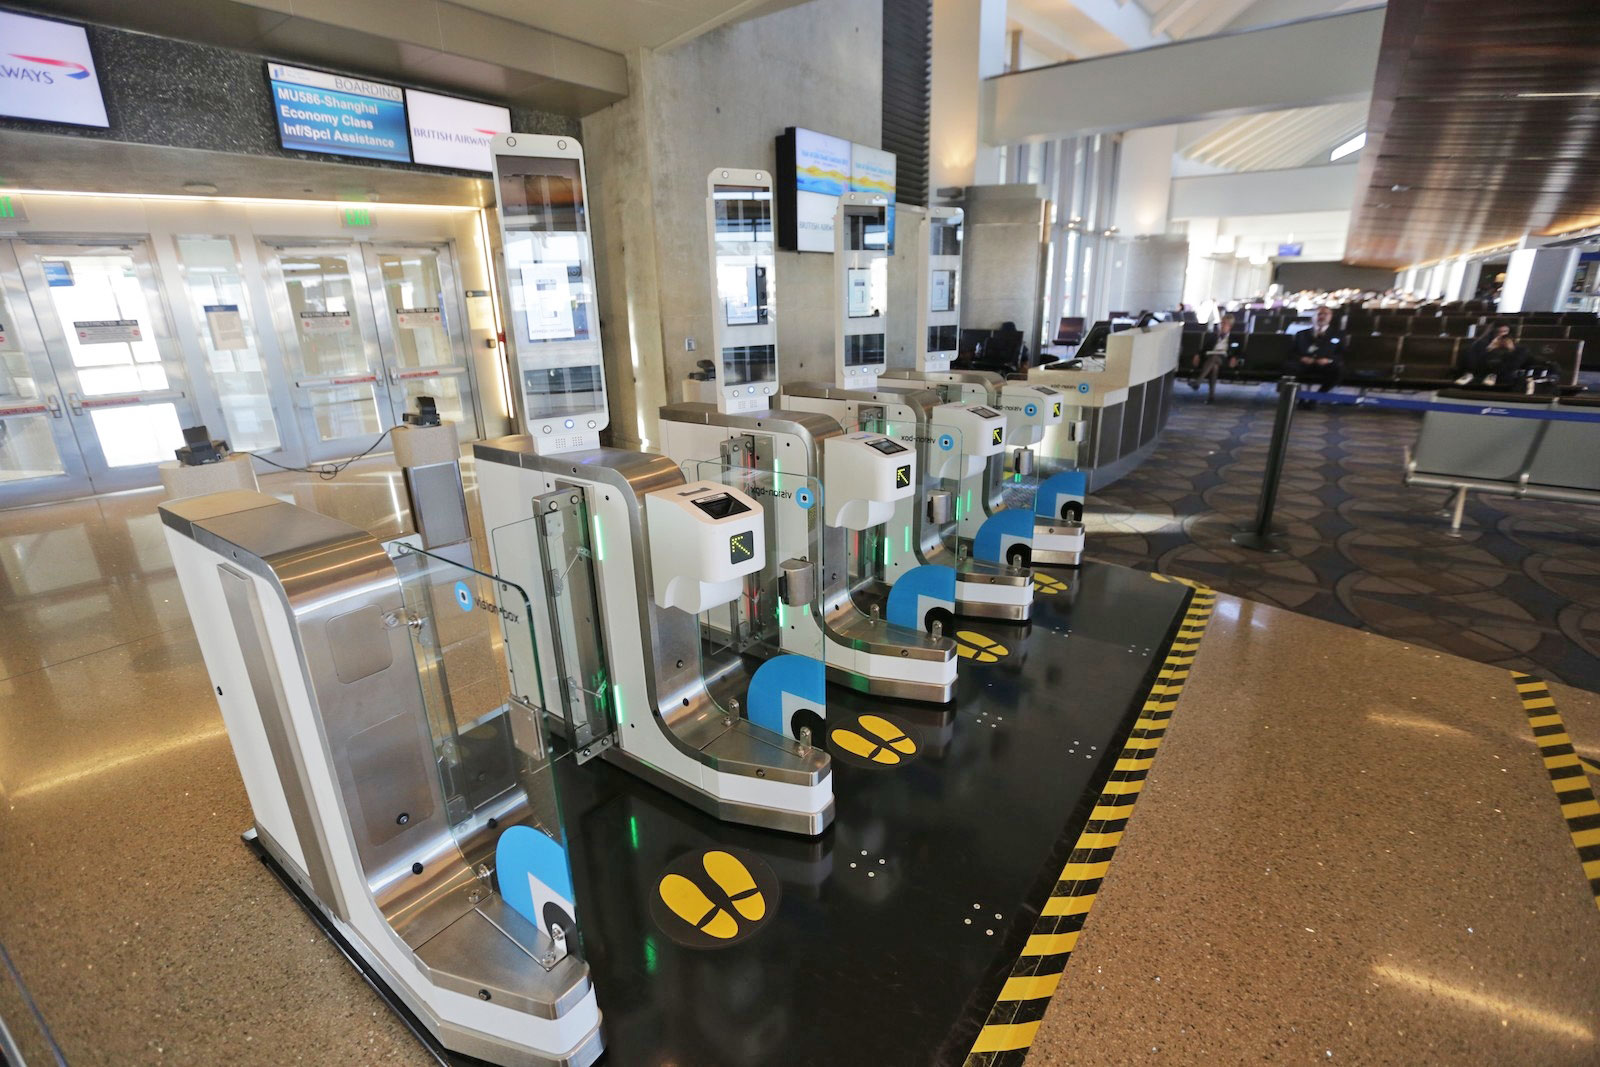 British Airways expands its biometric boarding gate trials